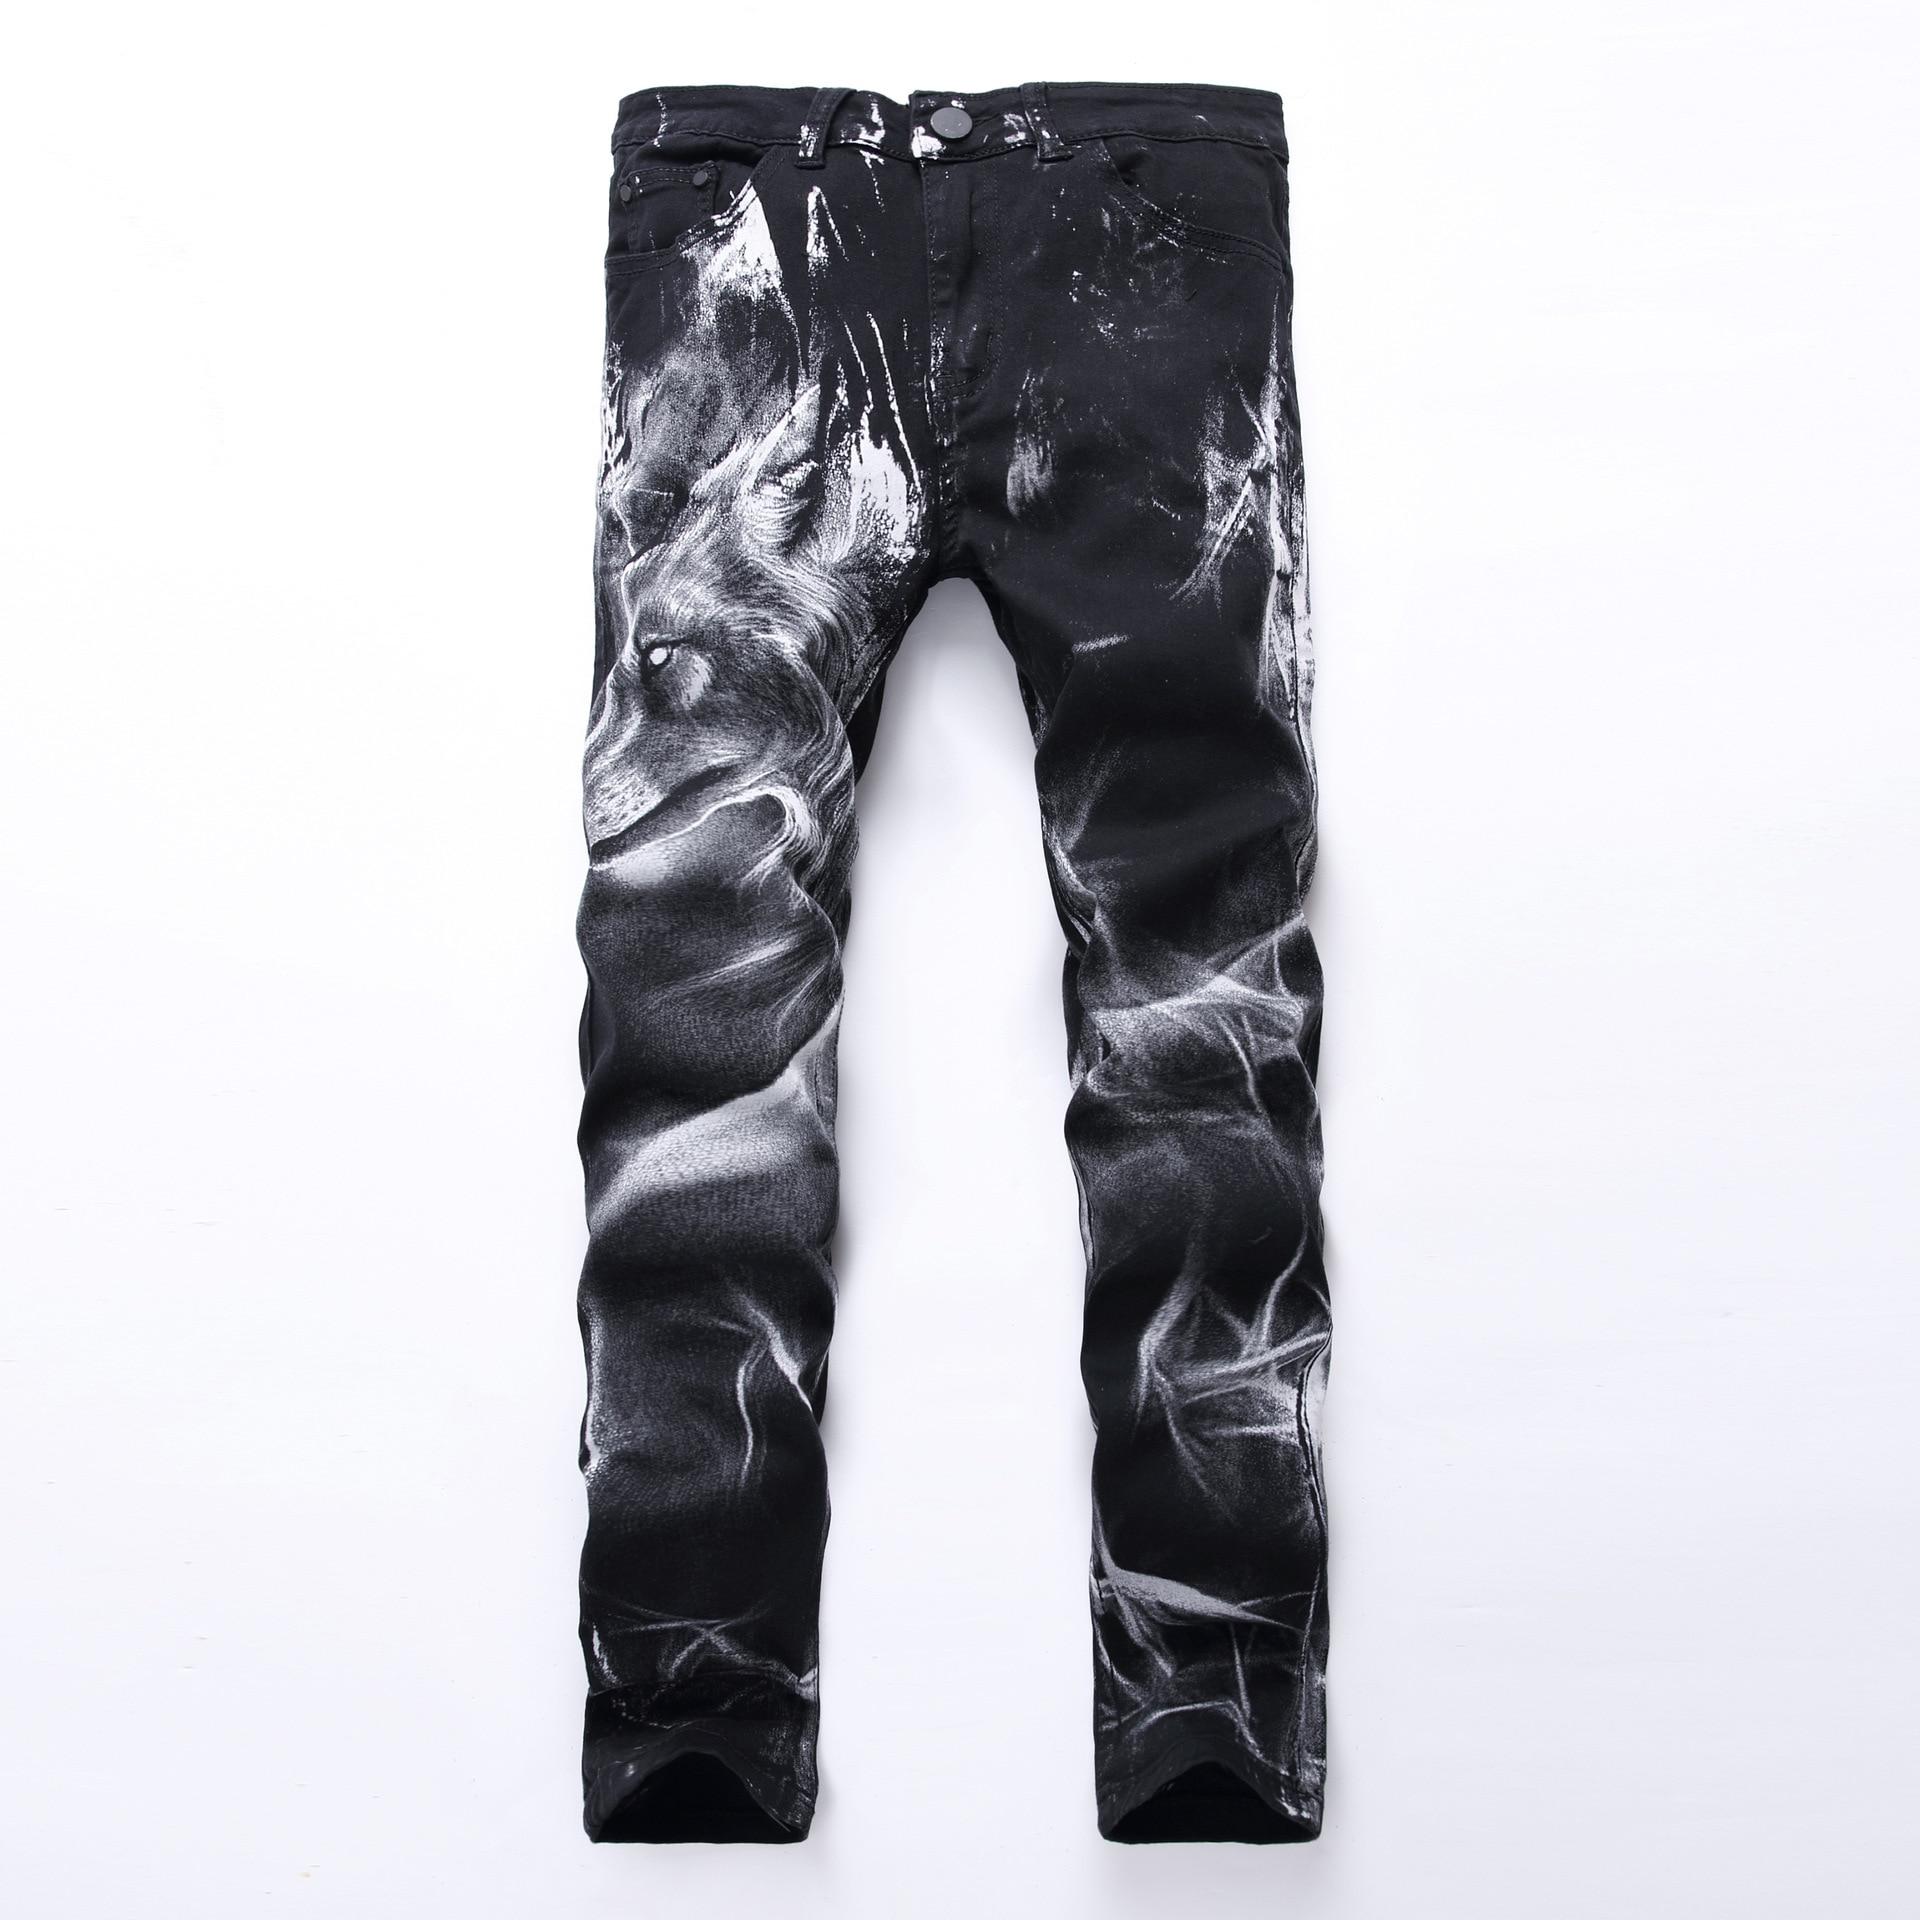 New 2018 mens wear cowboy pants wholesale hot style